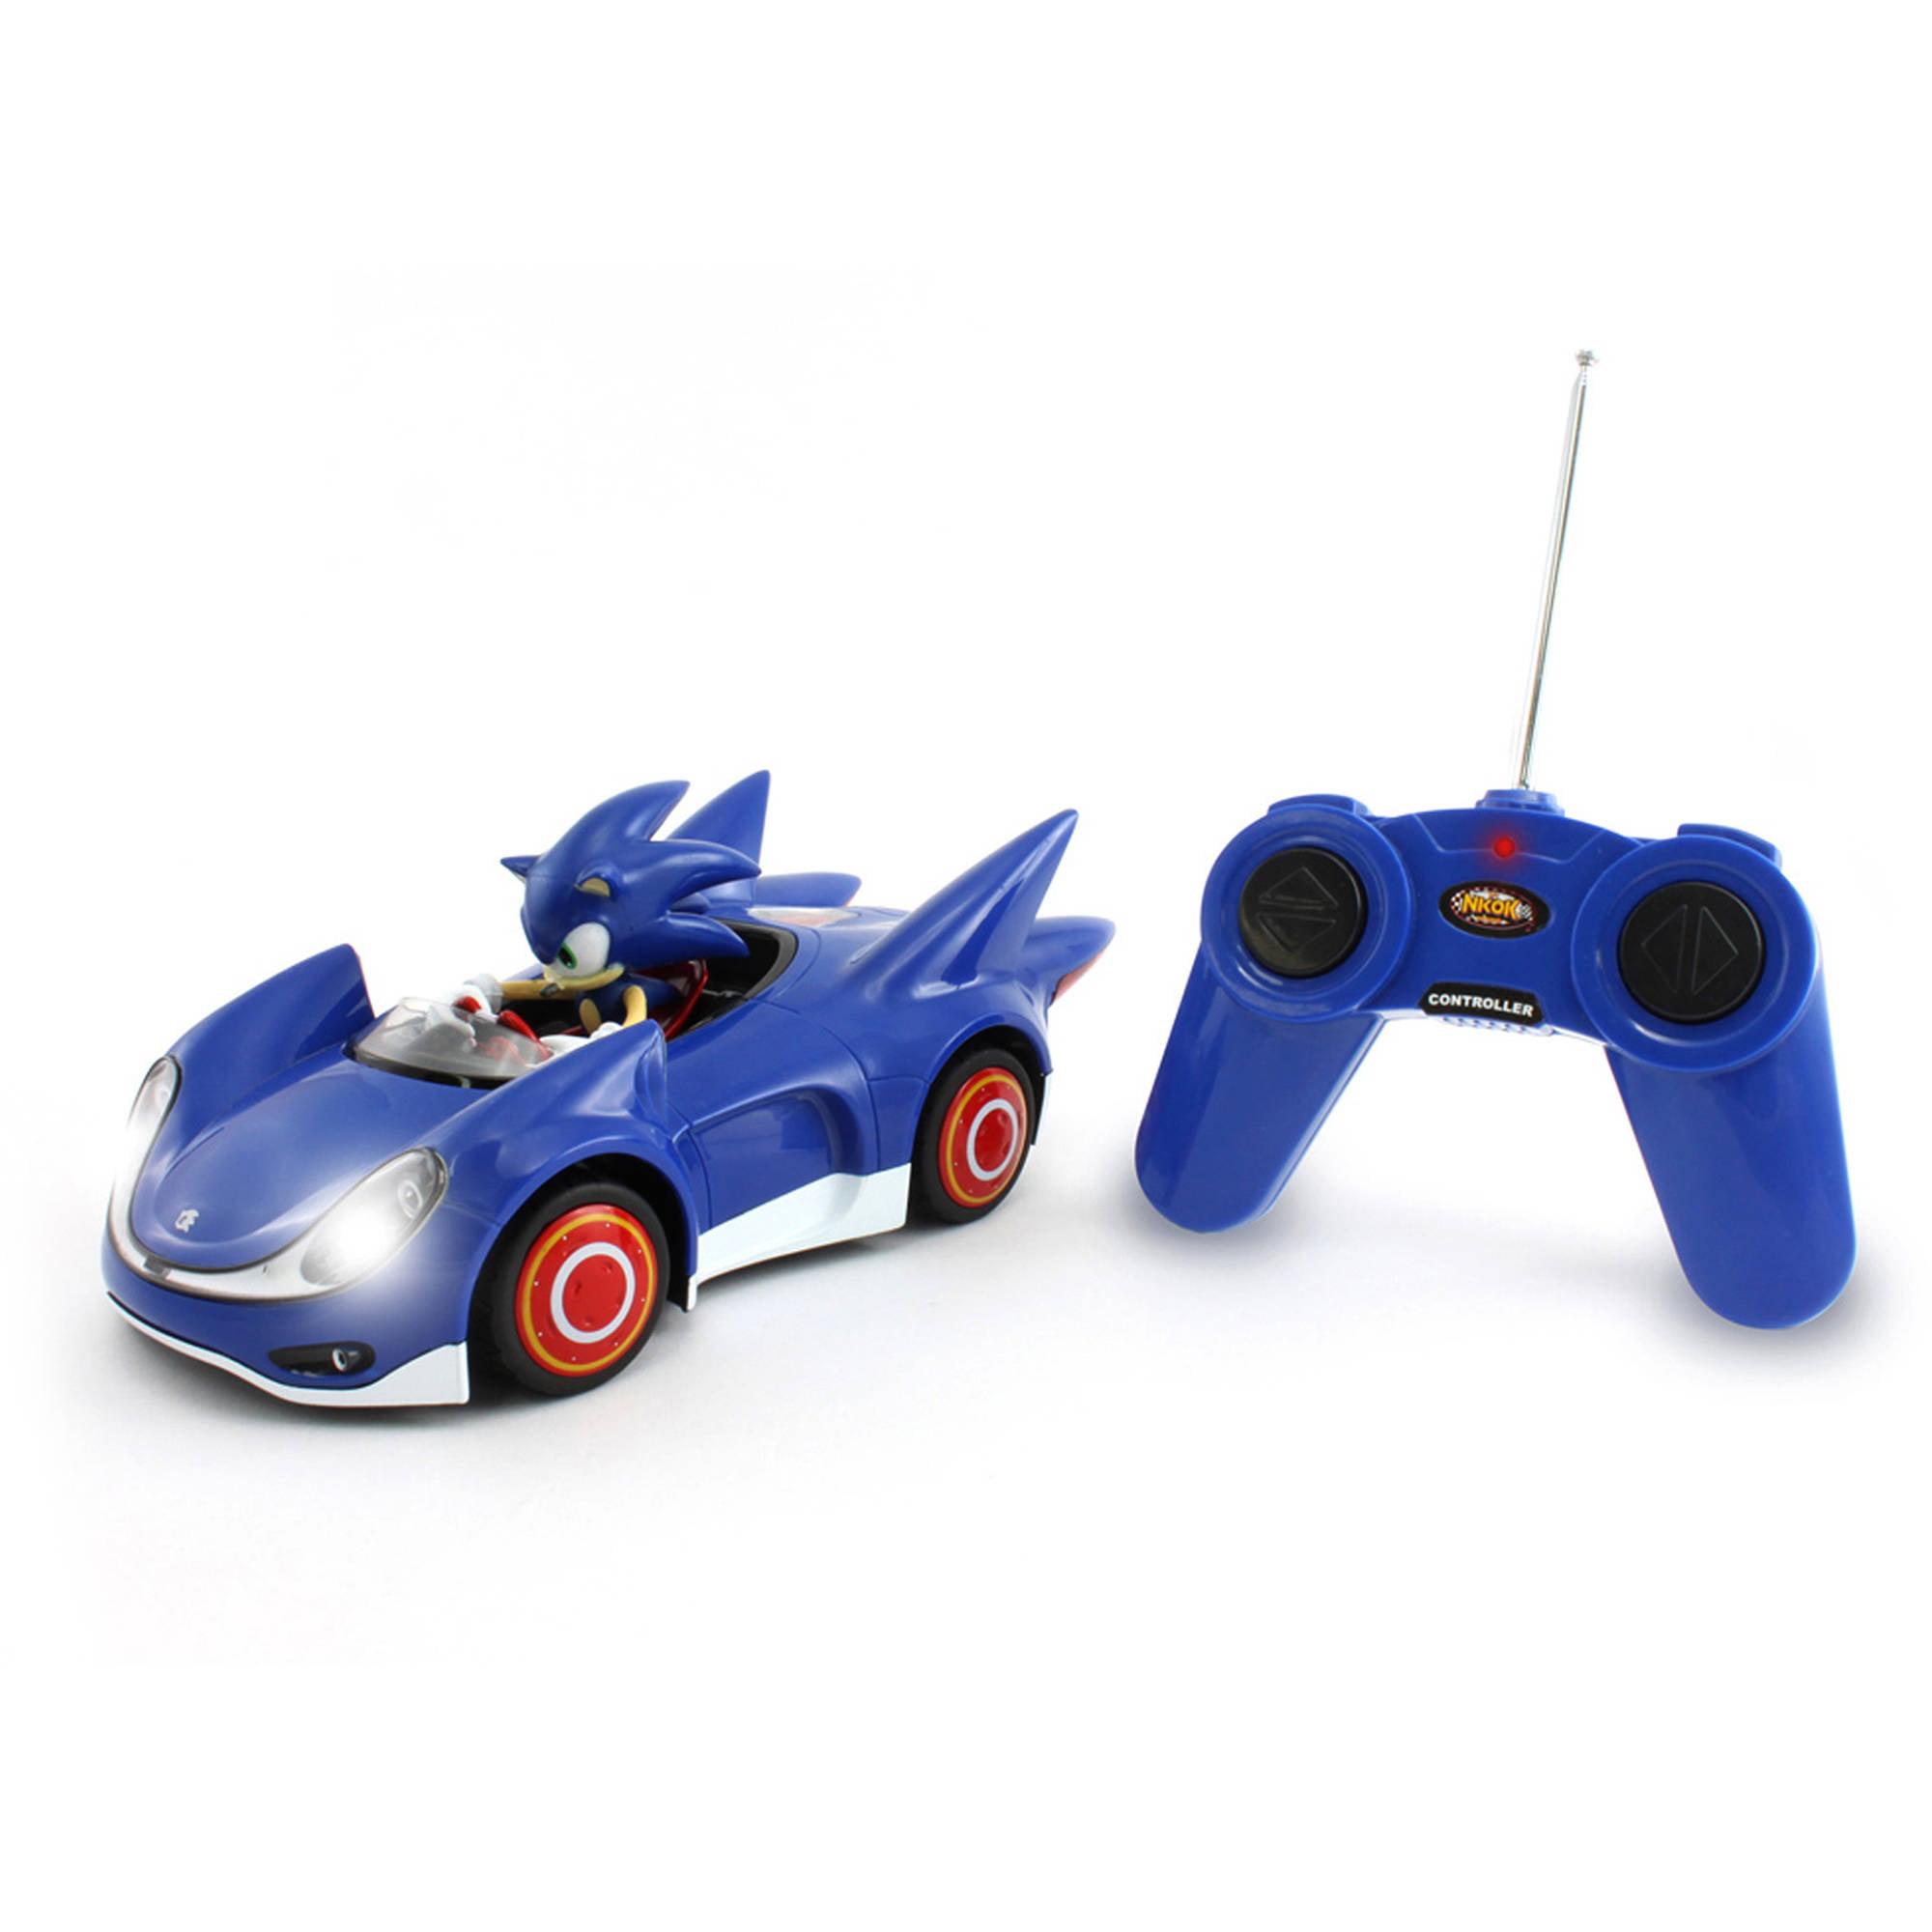 Sonic The Hedgehog And Sega All Stars Racing Radio Control Car Walmart Com Walmart Com